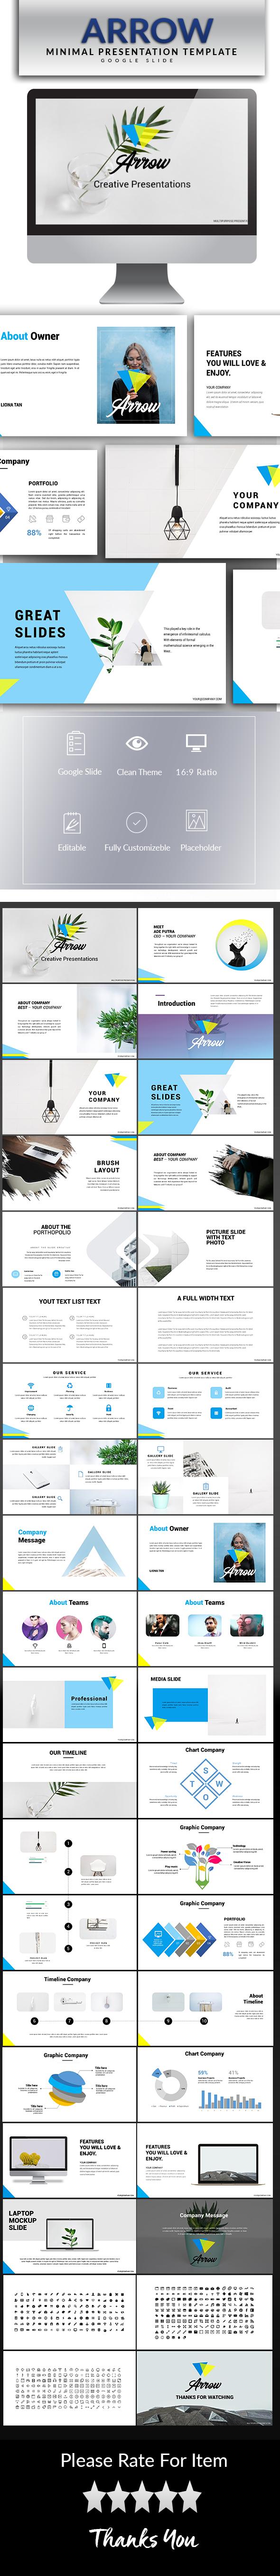 Arrow Google Slide Template - Google Slides Presentation Templates